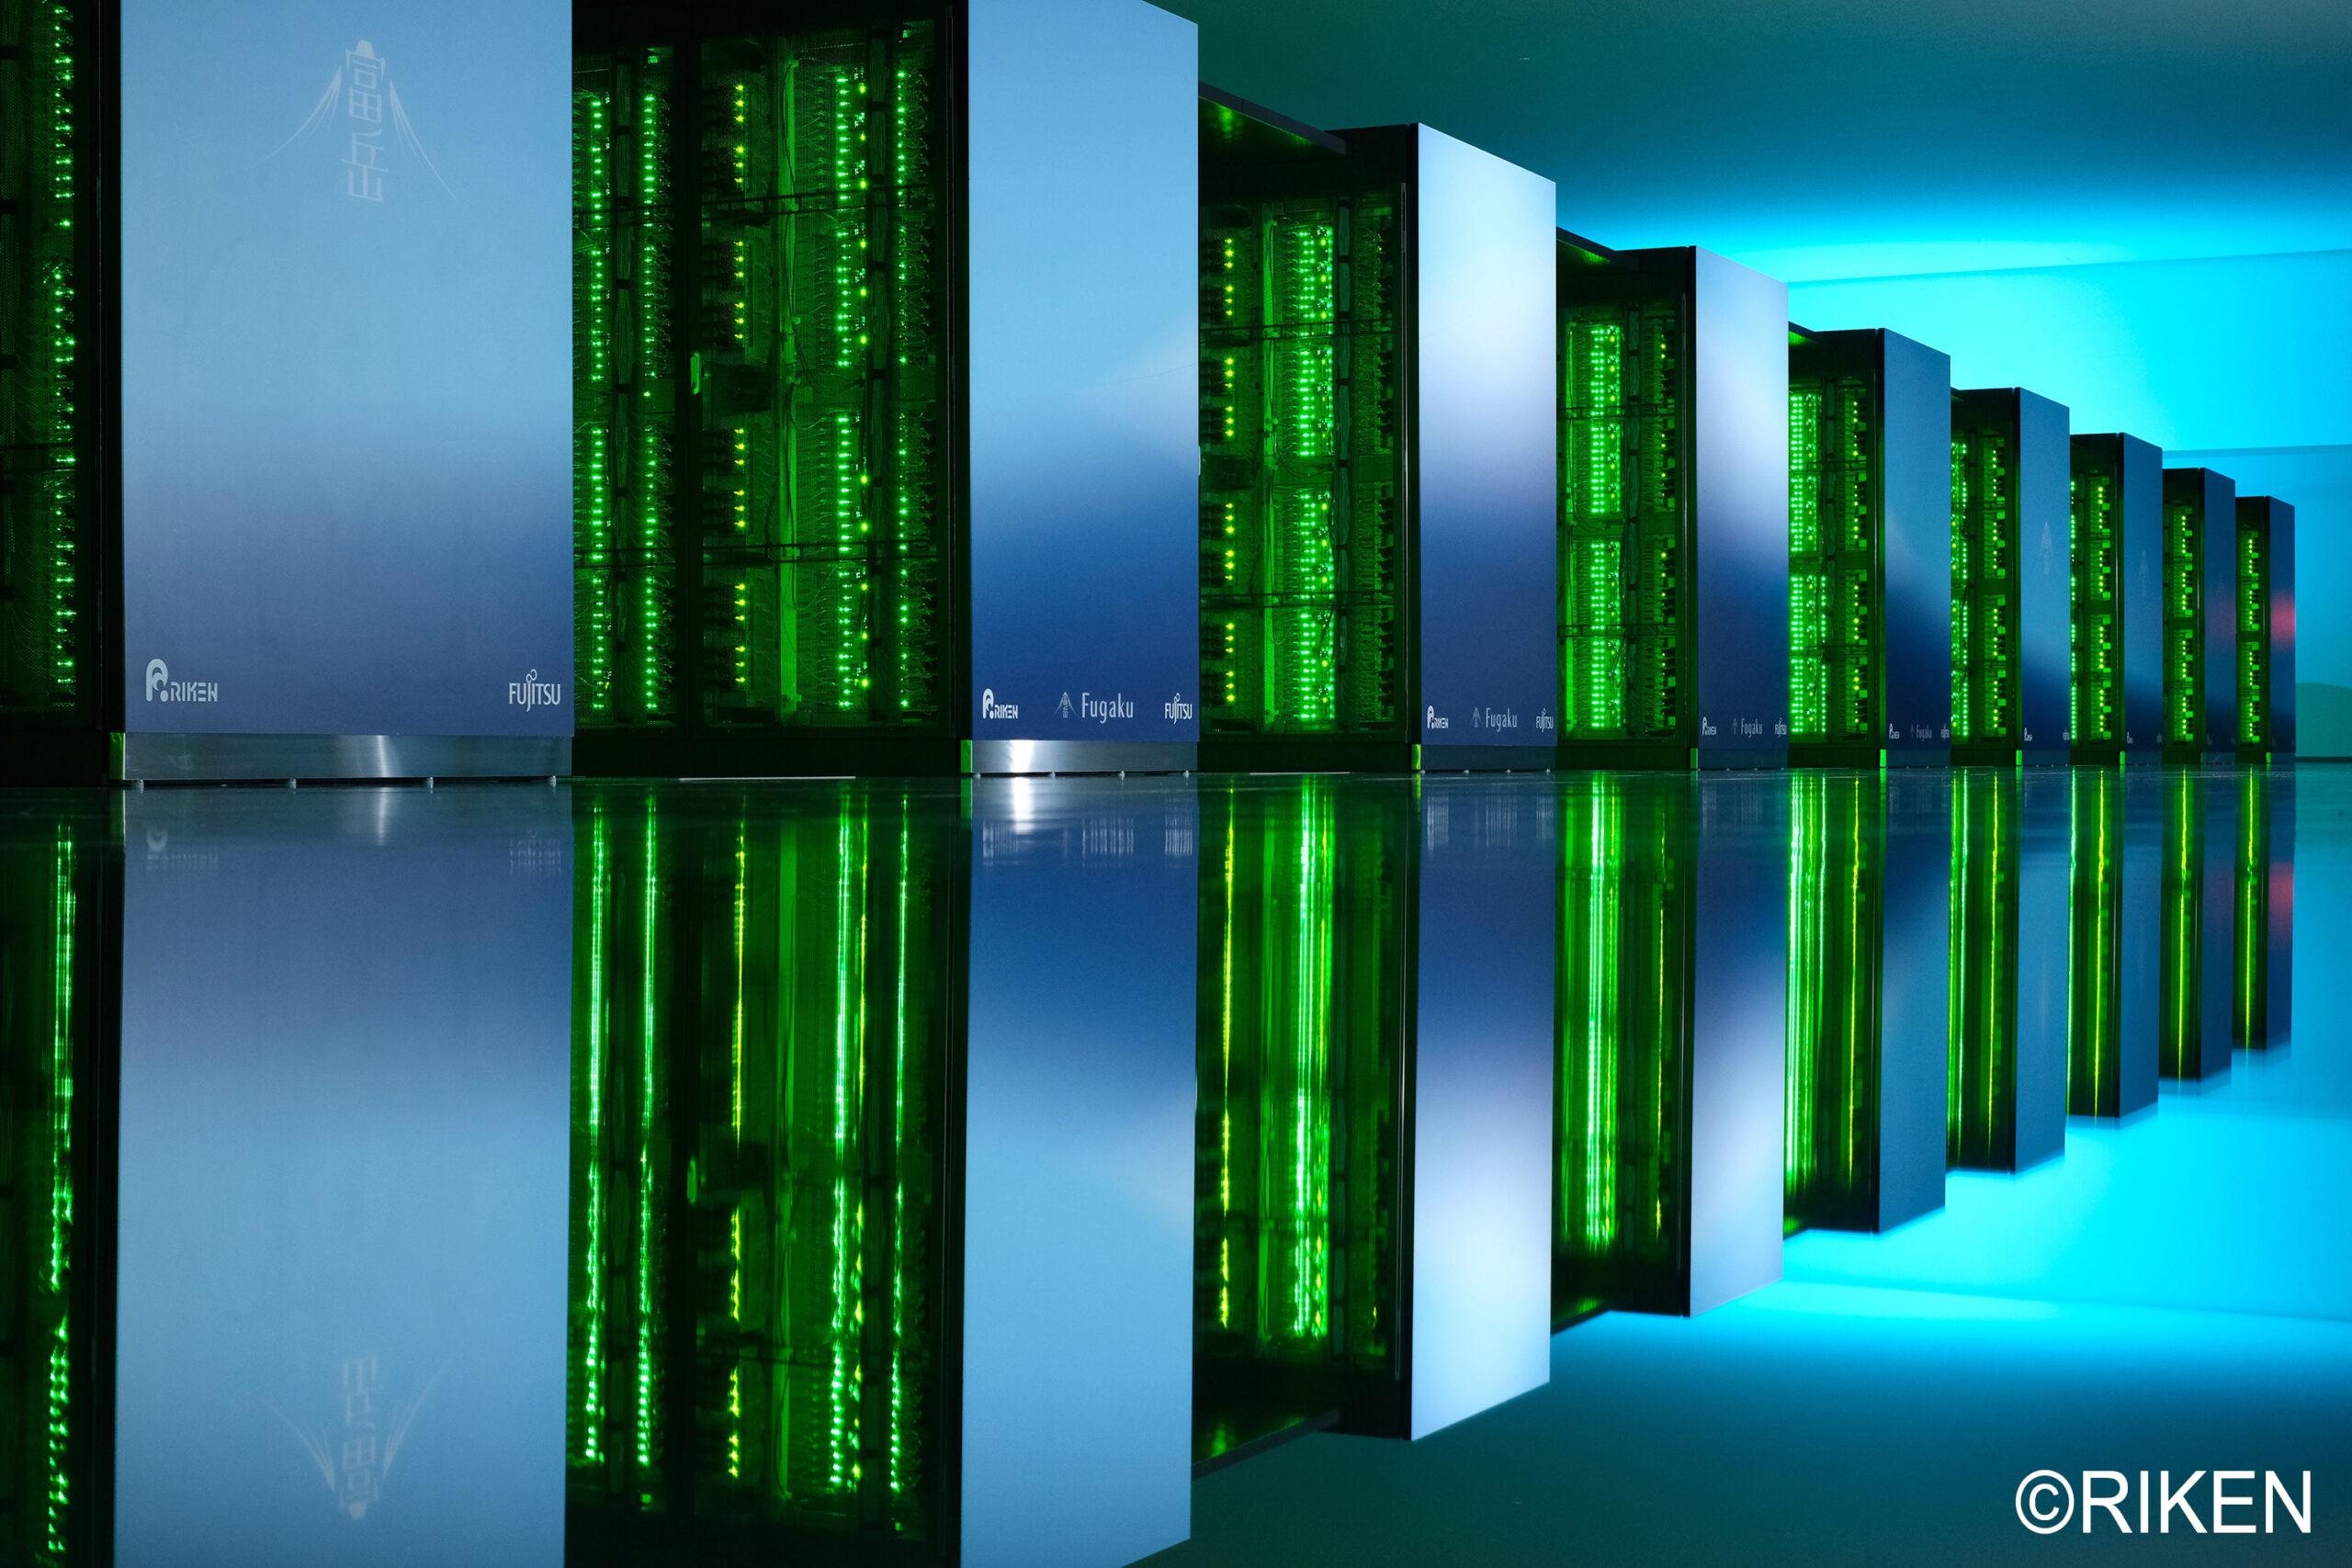 Image of Fugaku supercomputer with led lights on